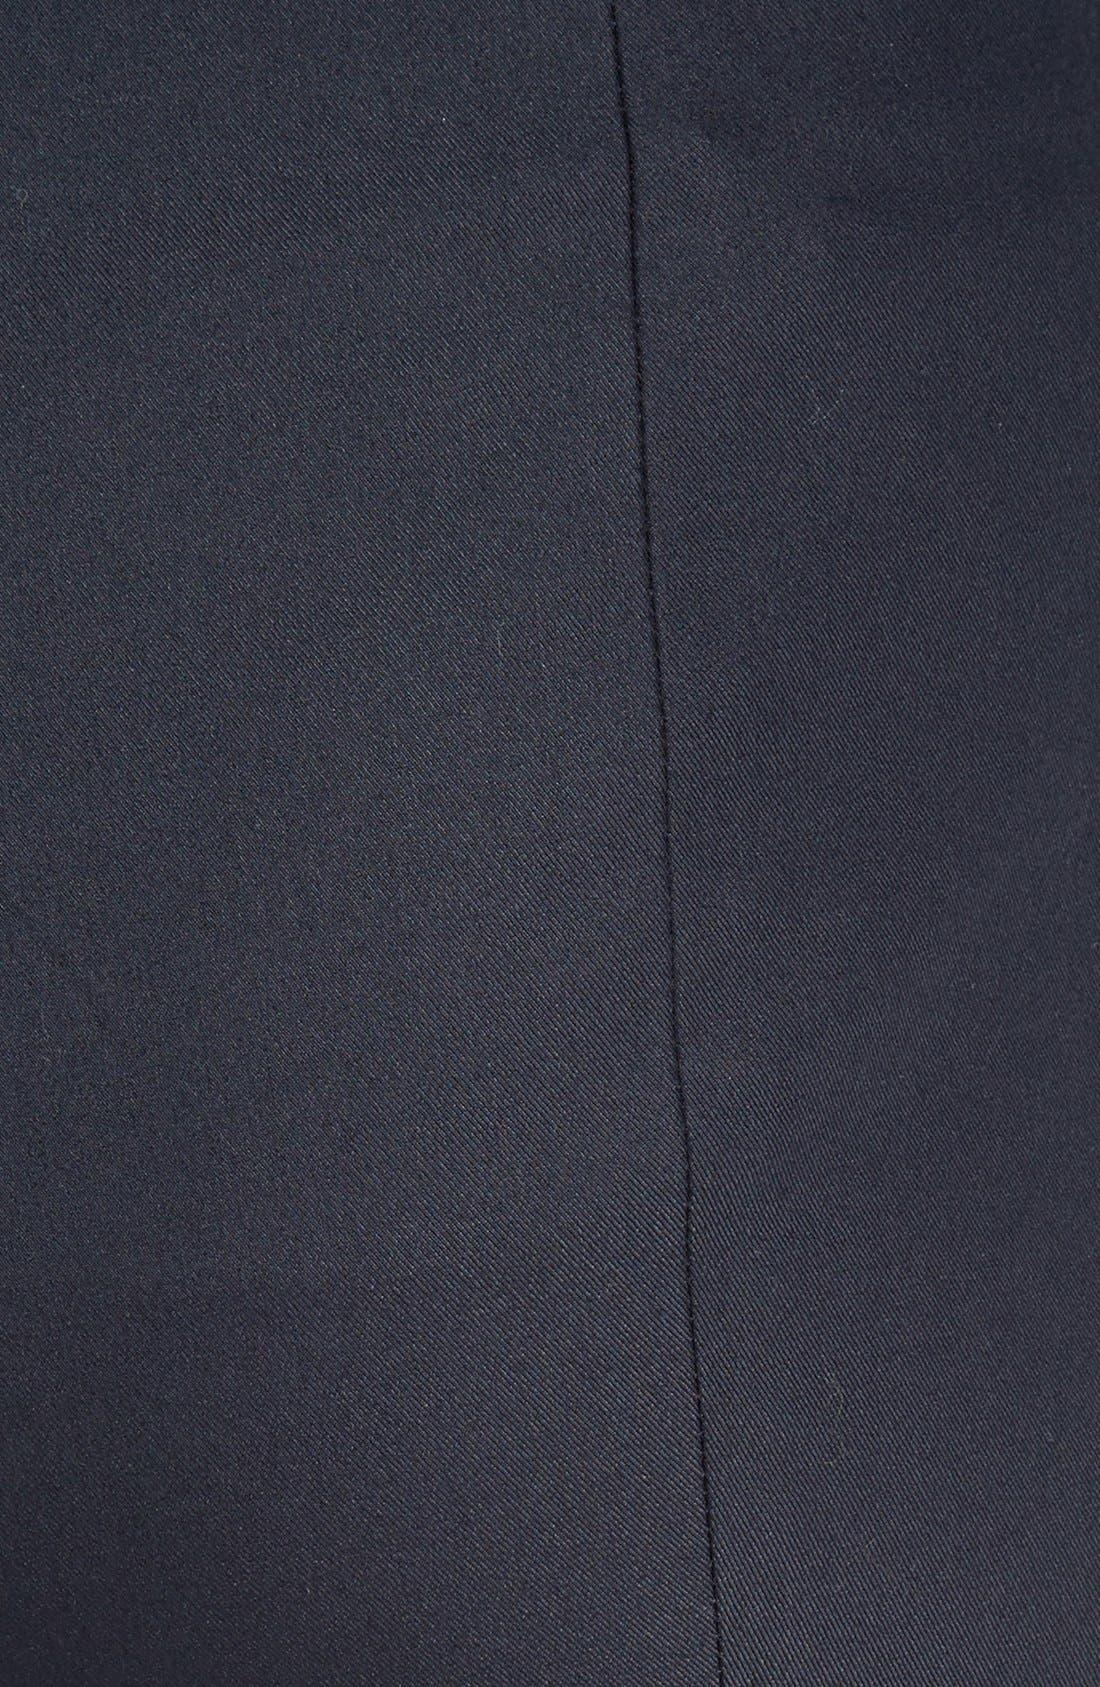 Alettah Stretch Skinny Pants,                             Alternate thumbnail 7, color,                             001